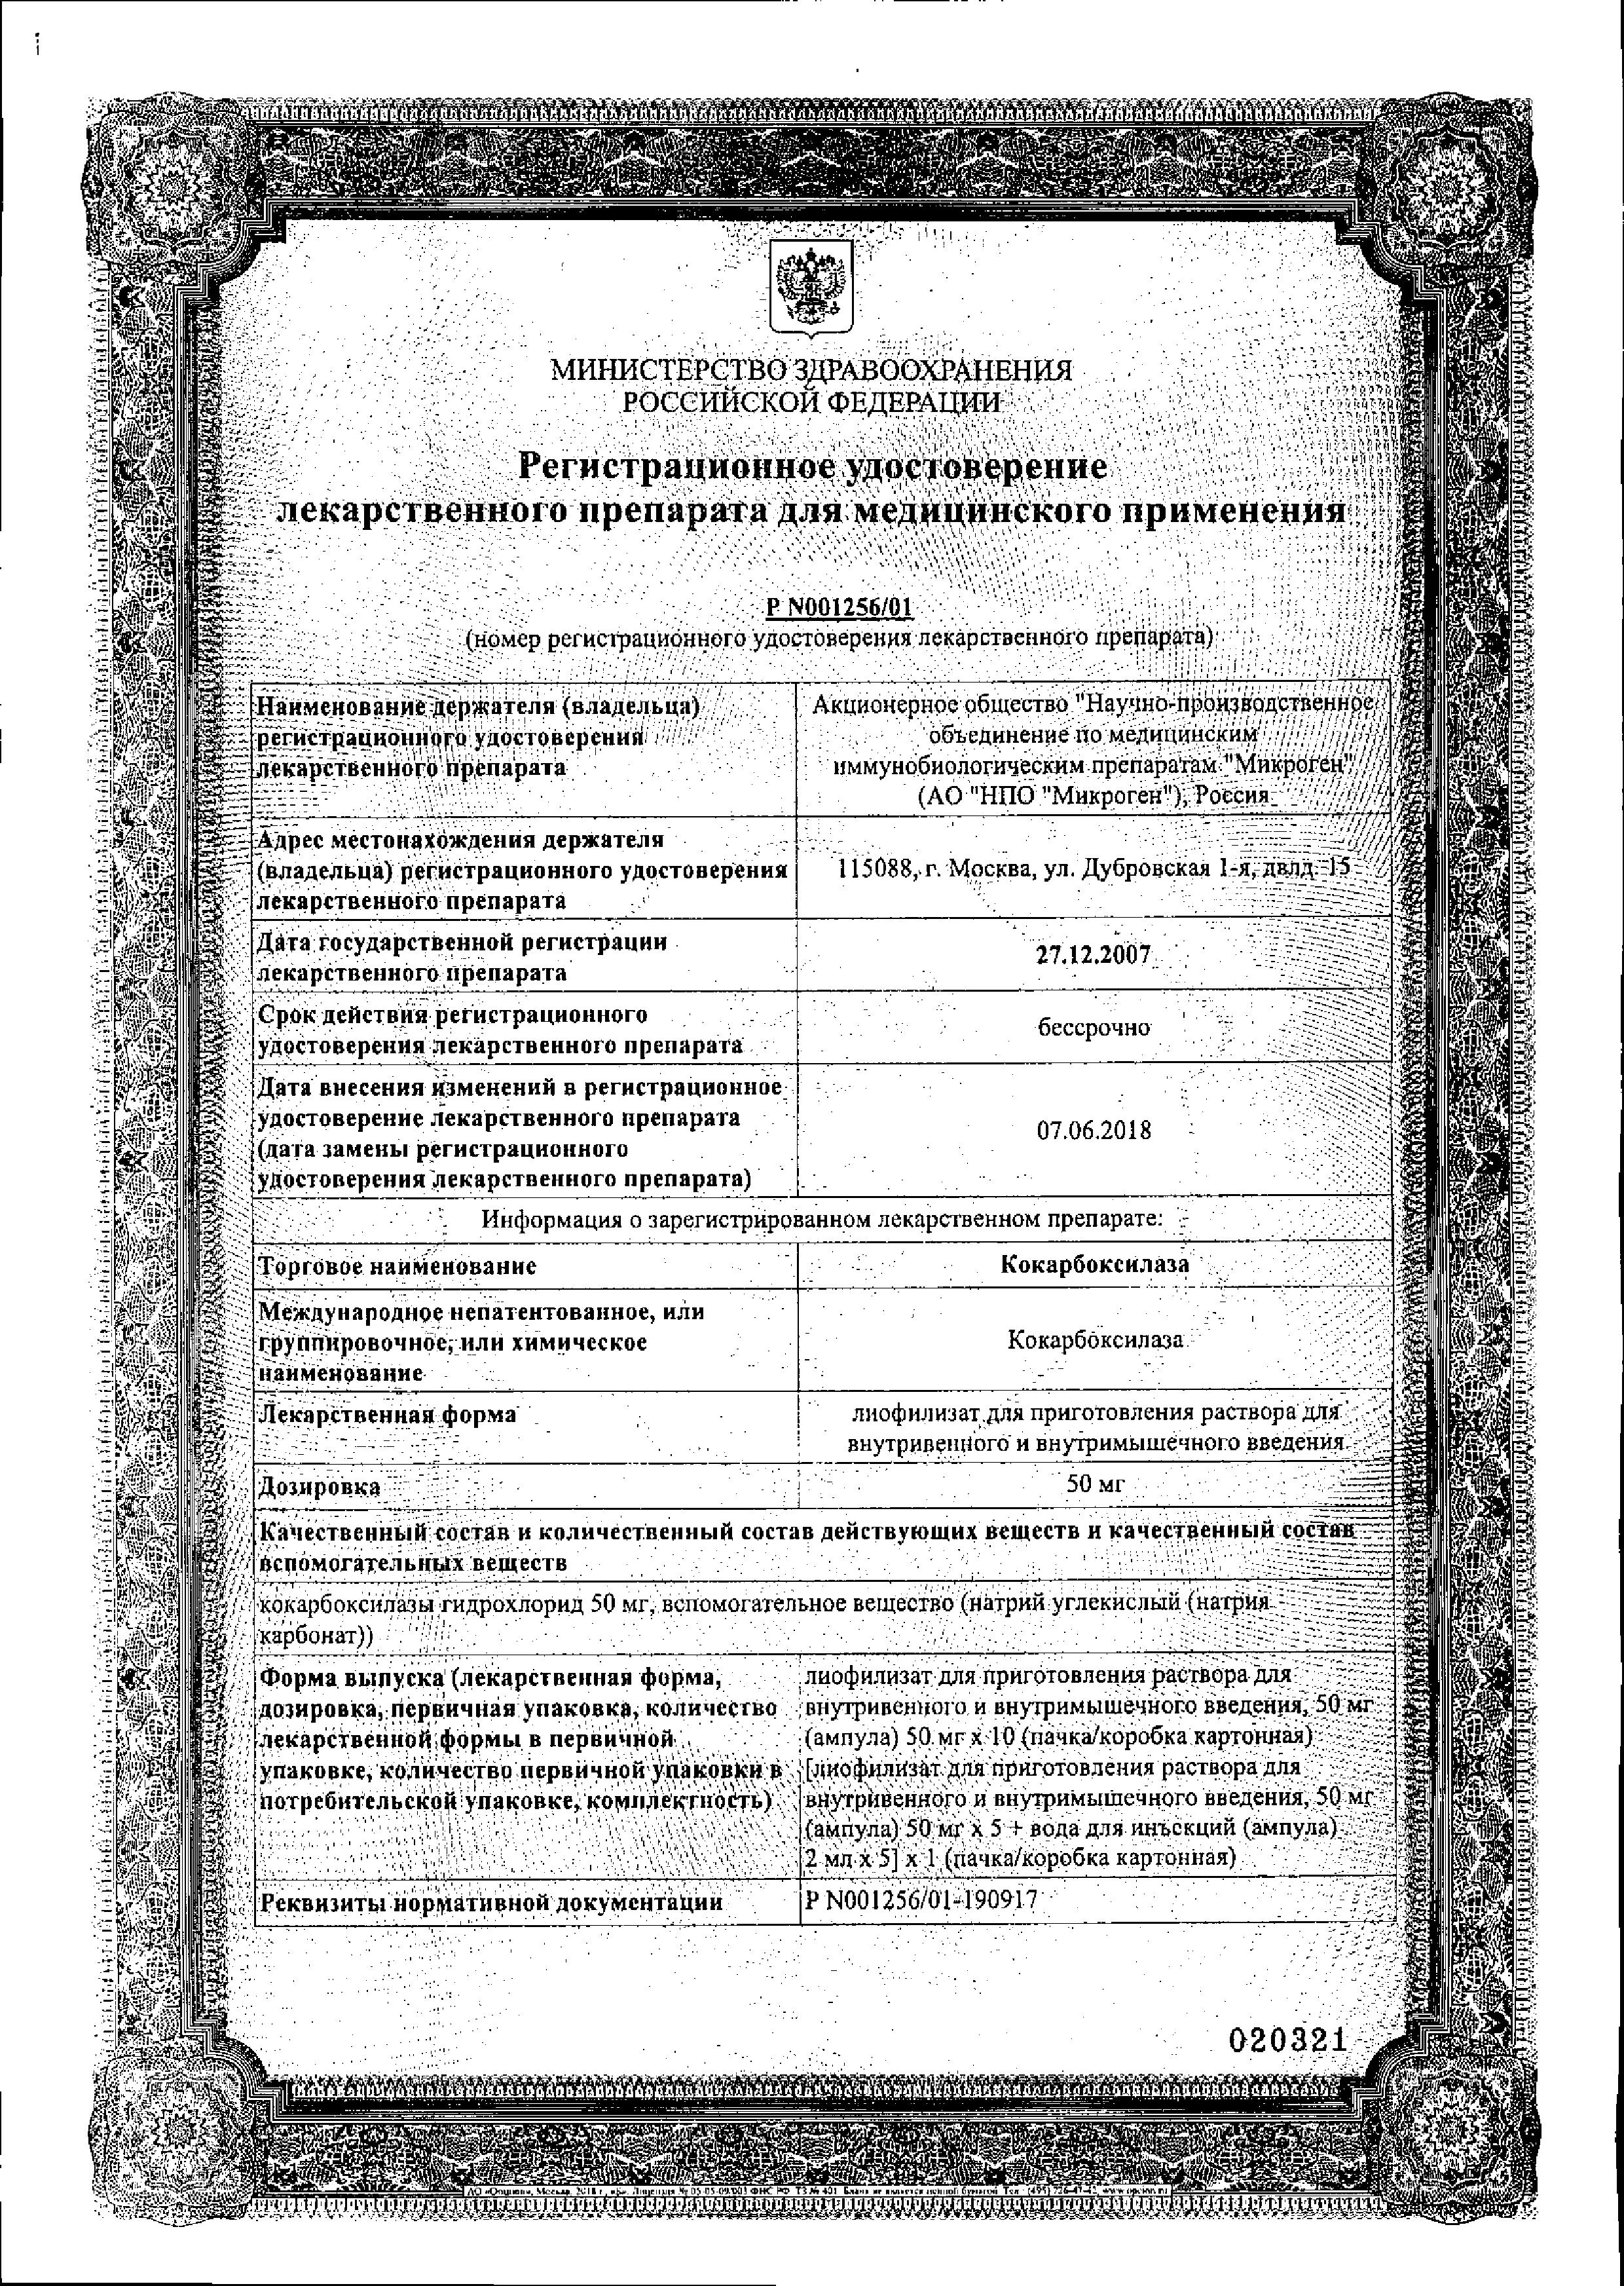 Кокарбоксилаза сертификат